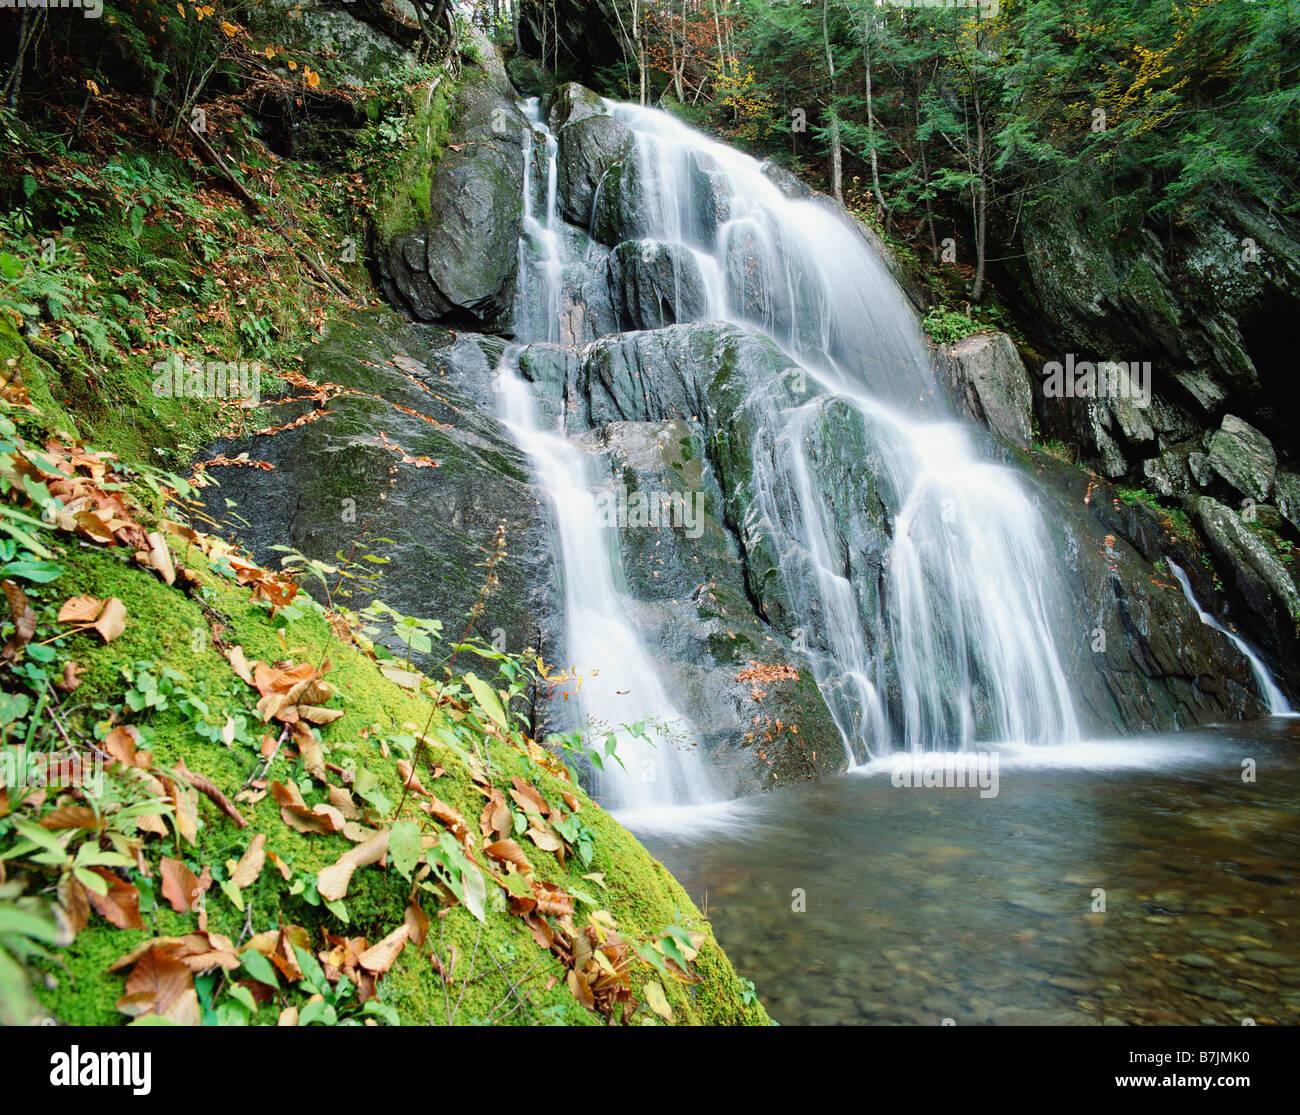 USA VERMONT GREEN MOUNTAIN NATIONAL FOREST MOSS GLEN FALLS - Stock Image